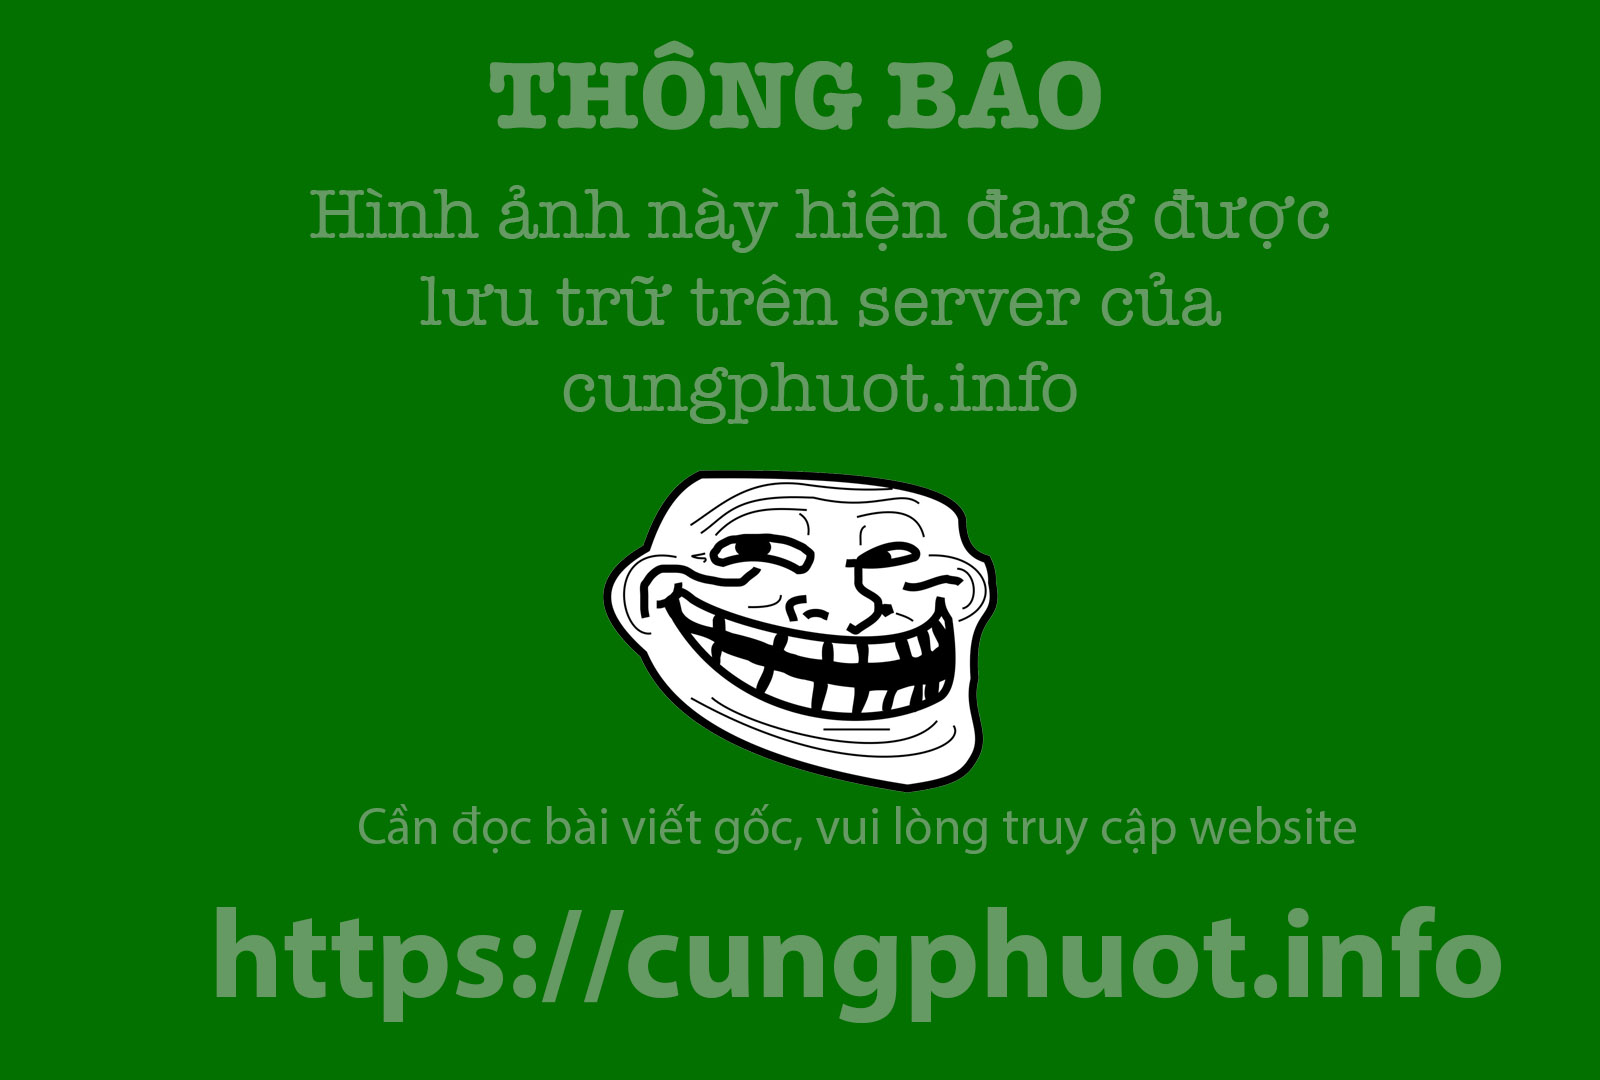 Dan phuot me man ve dep ky vi cua hang Prai o Quang Tri hinh anh 15